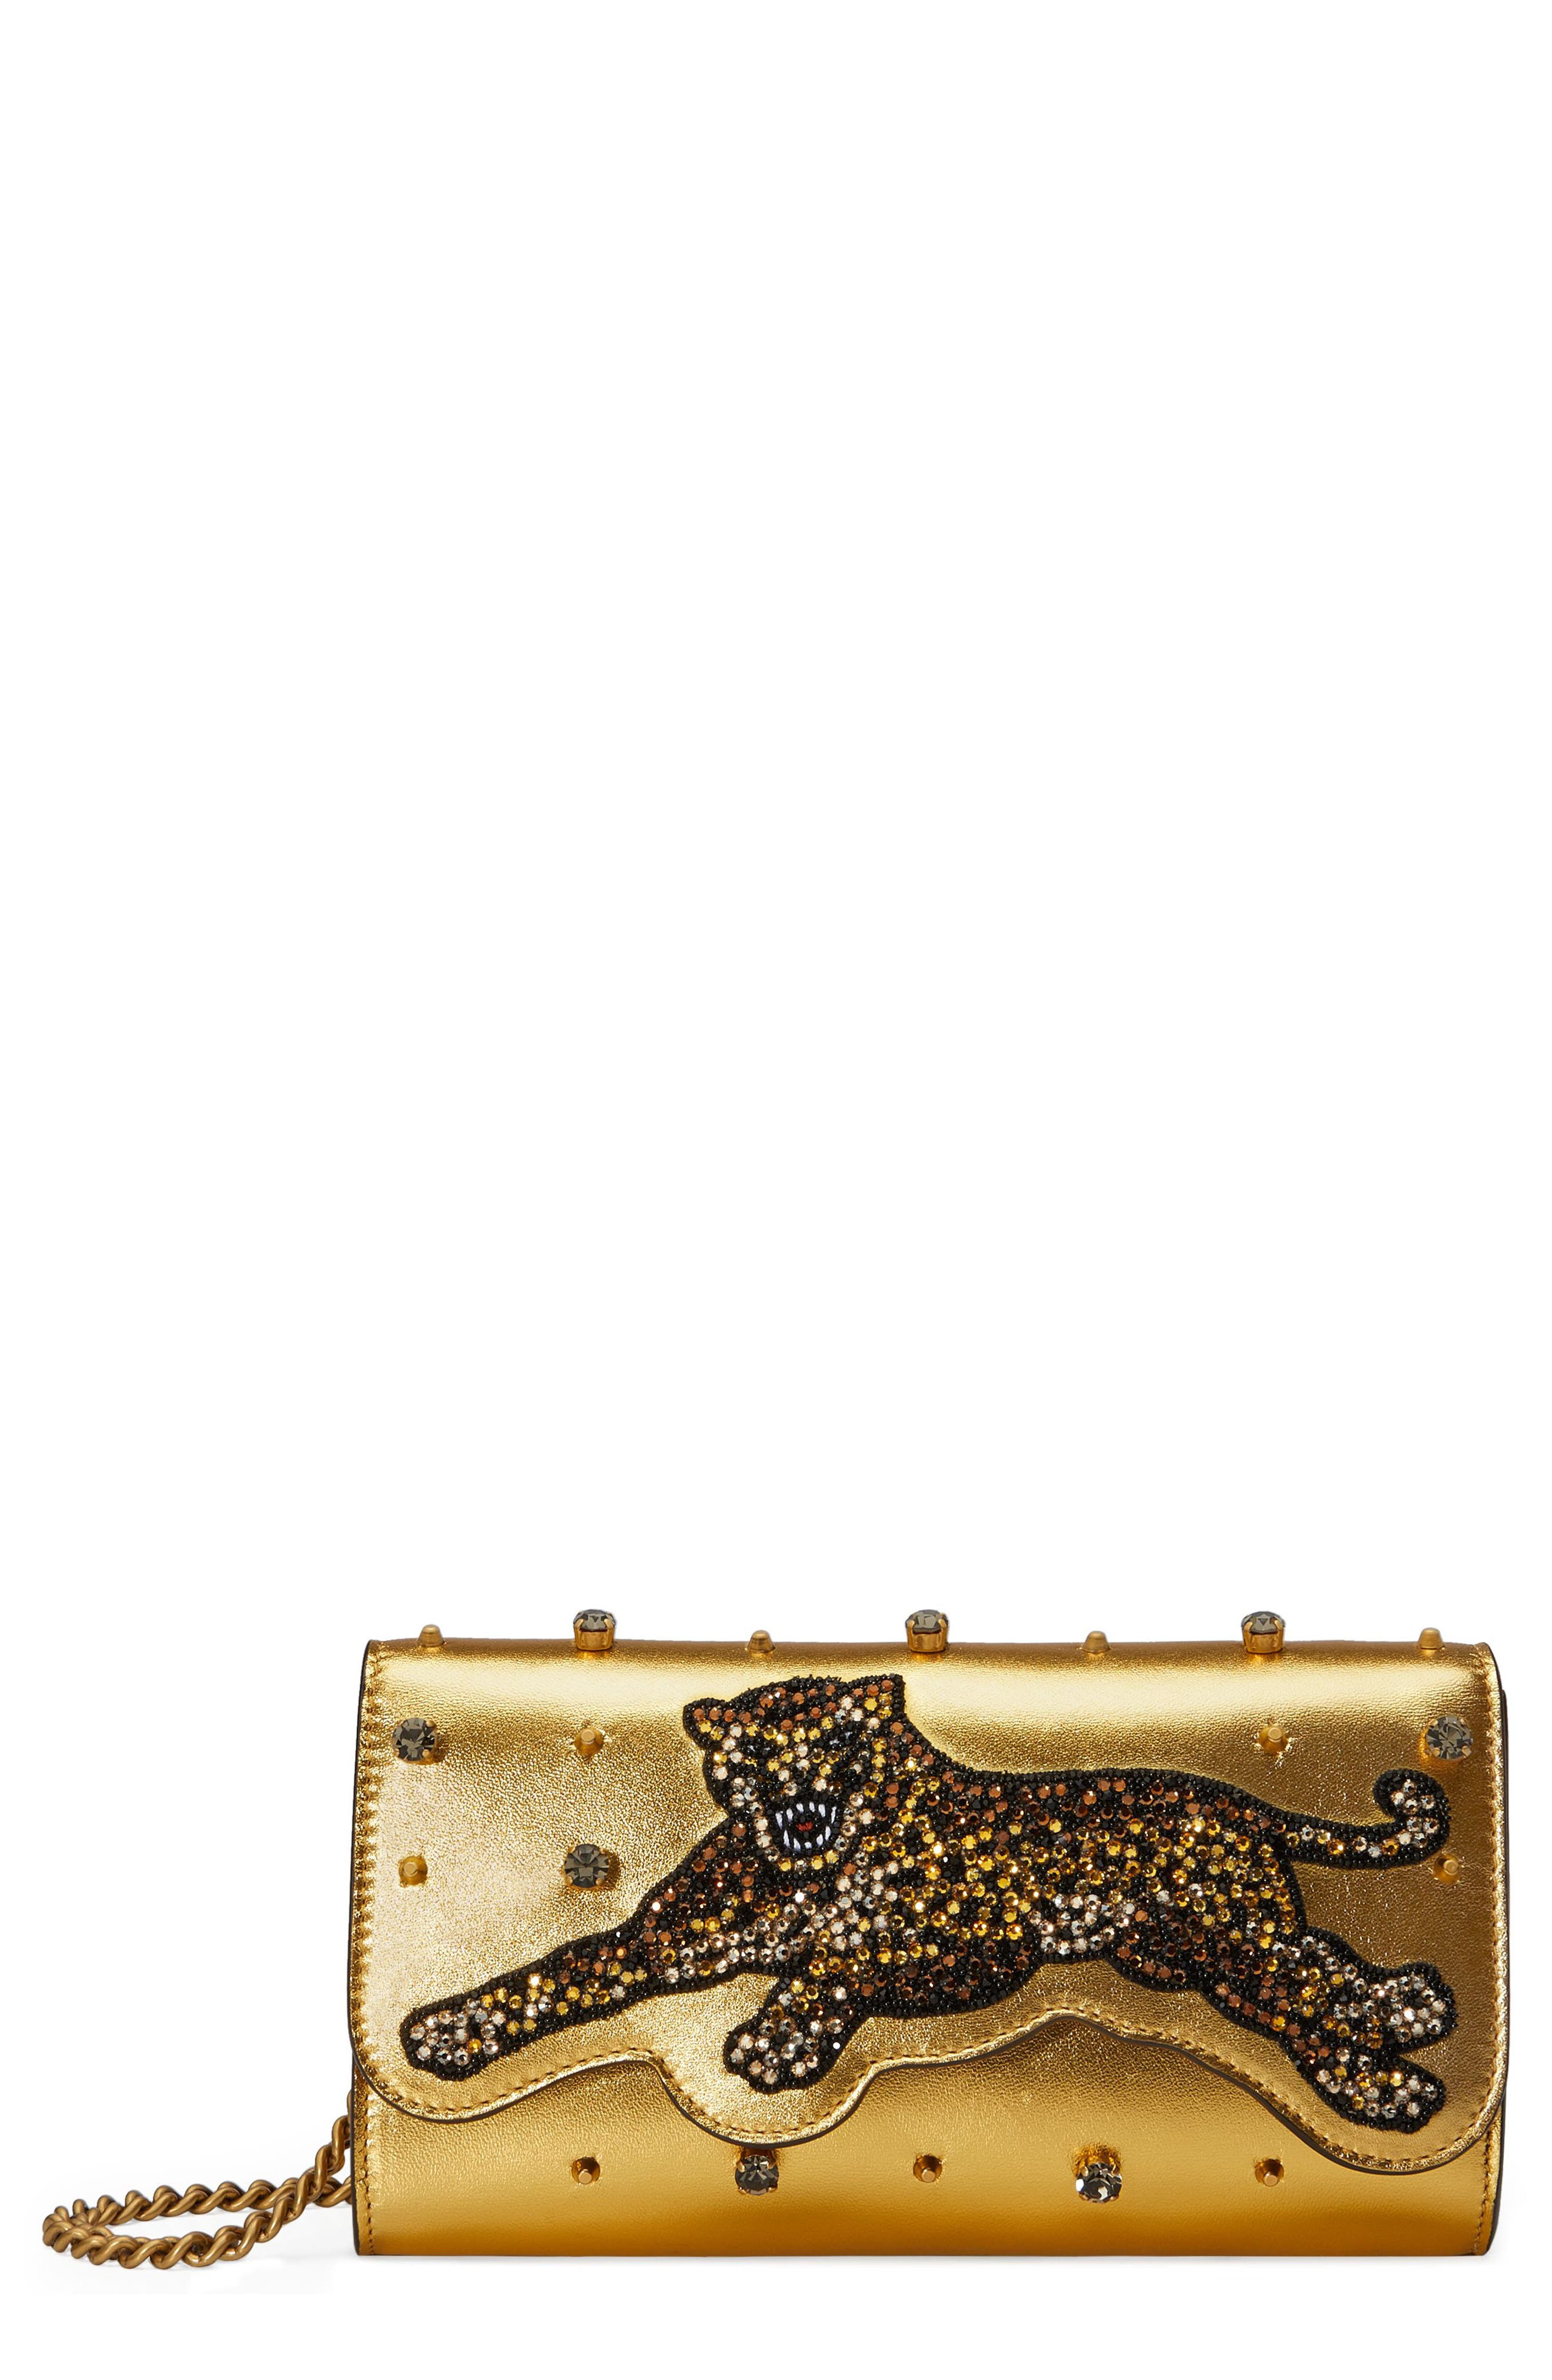 Main Image - Gucci Broadway Metallic Leather Shoulder Bag